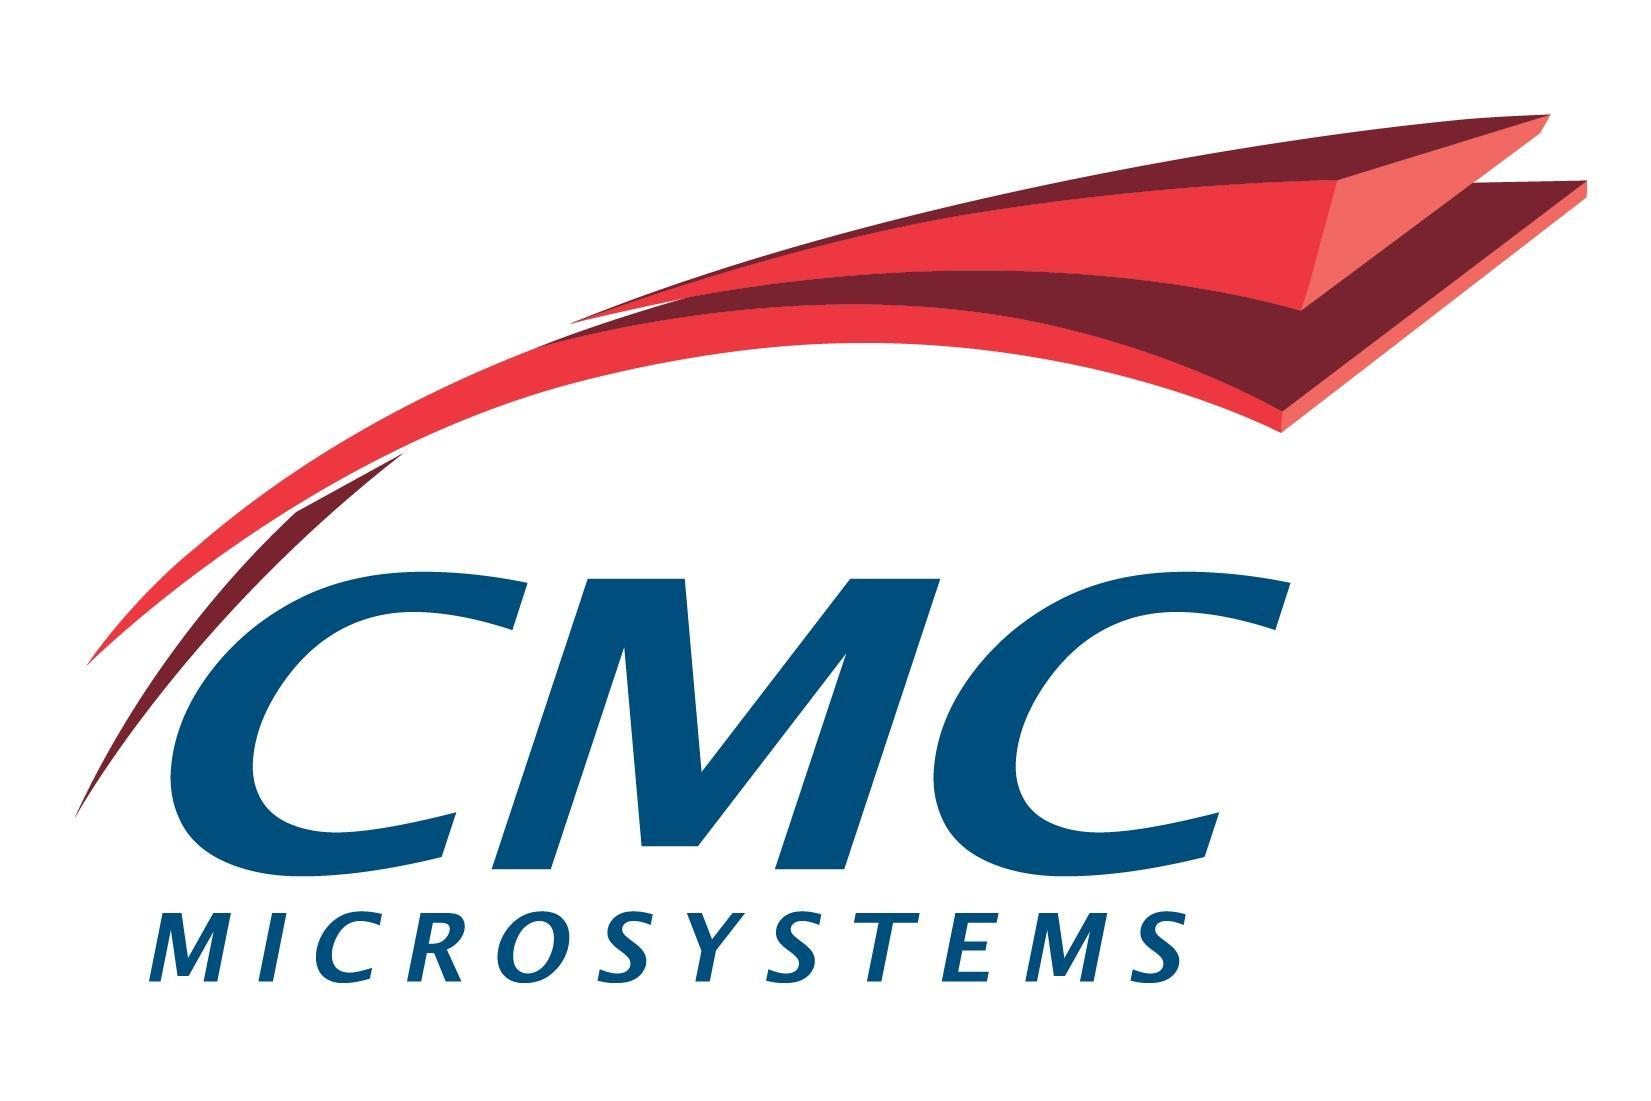 CMC Microsystems company logo